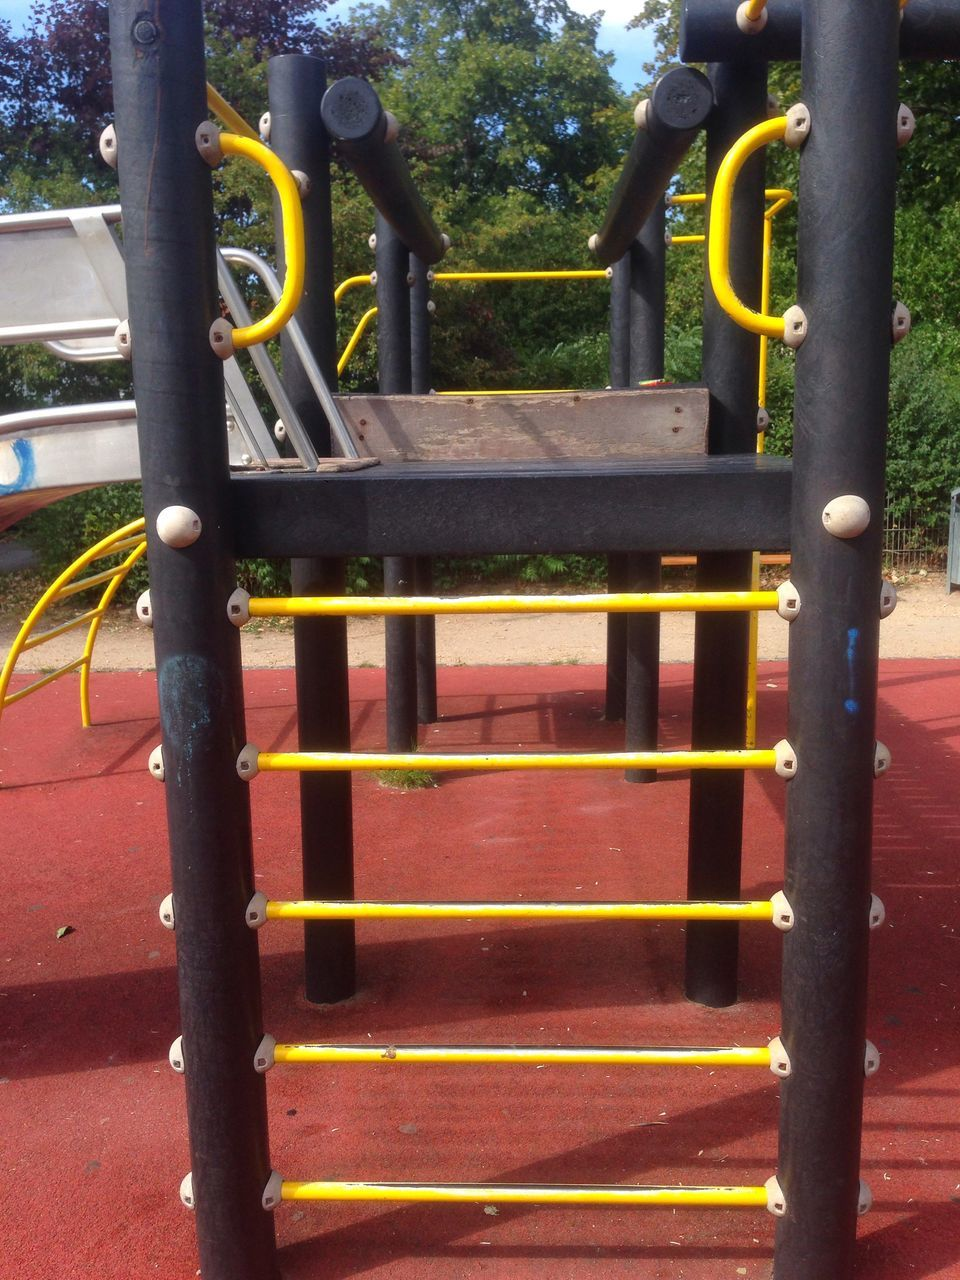 Ladder At Playground In Park